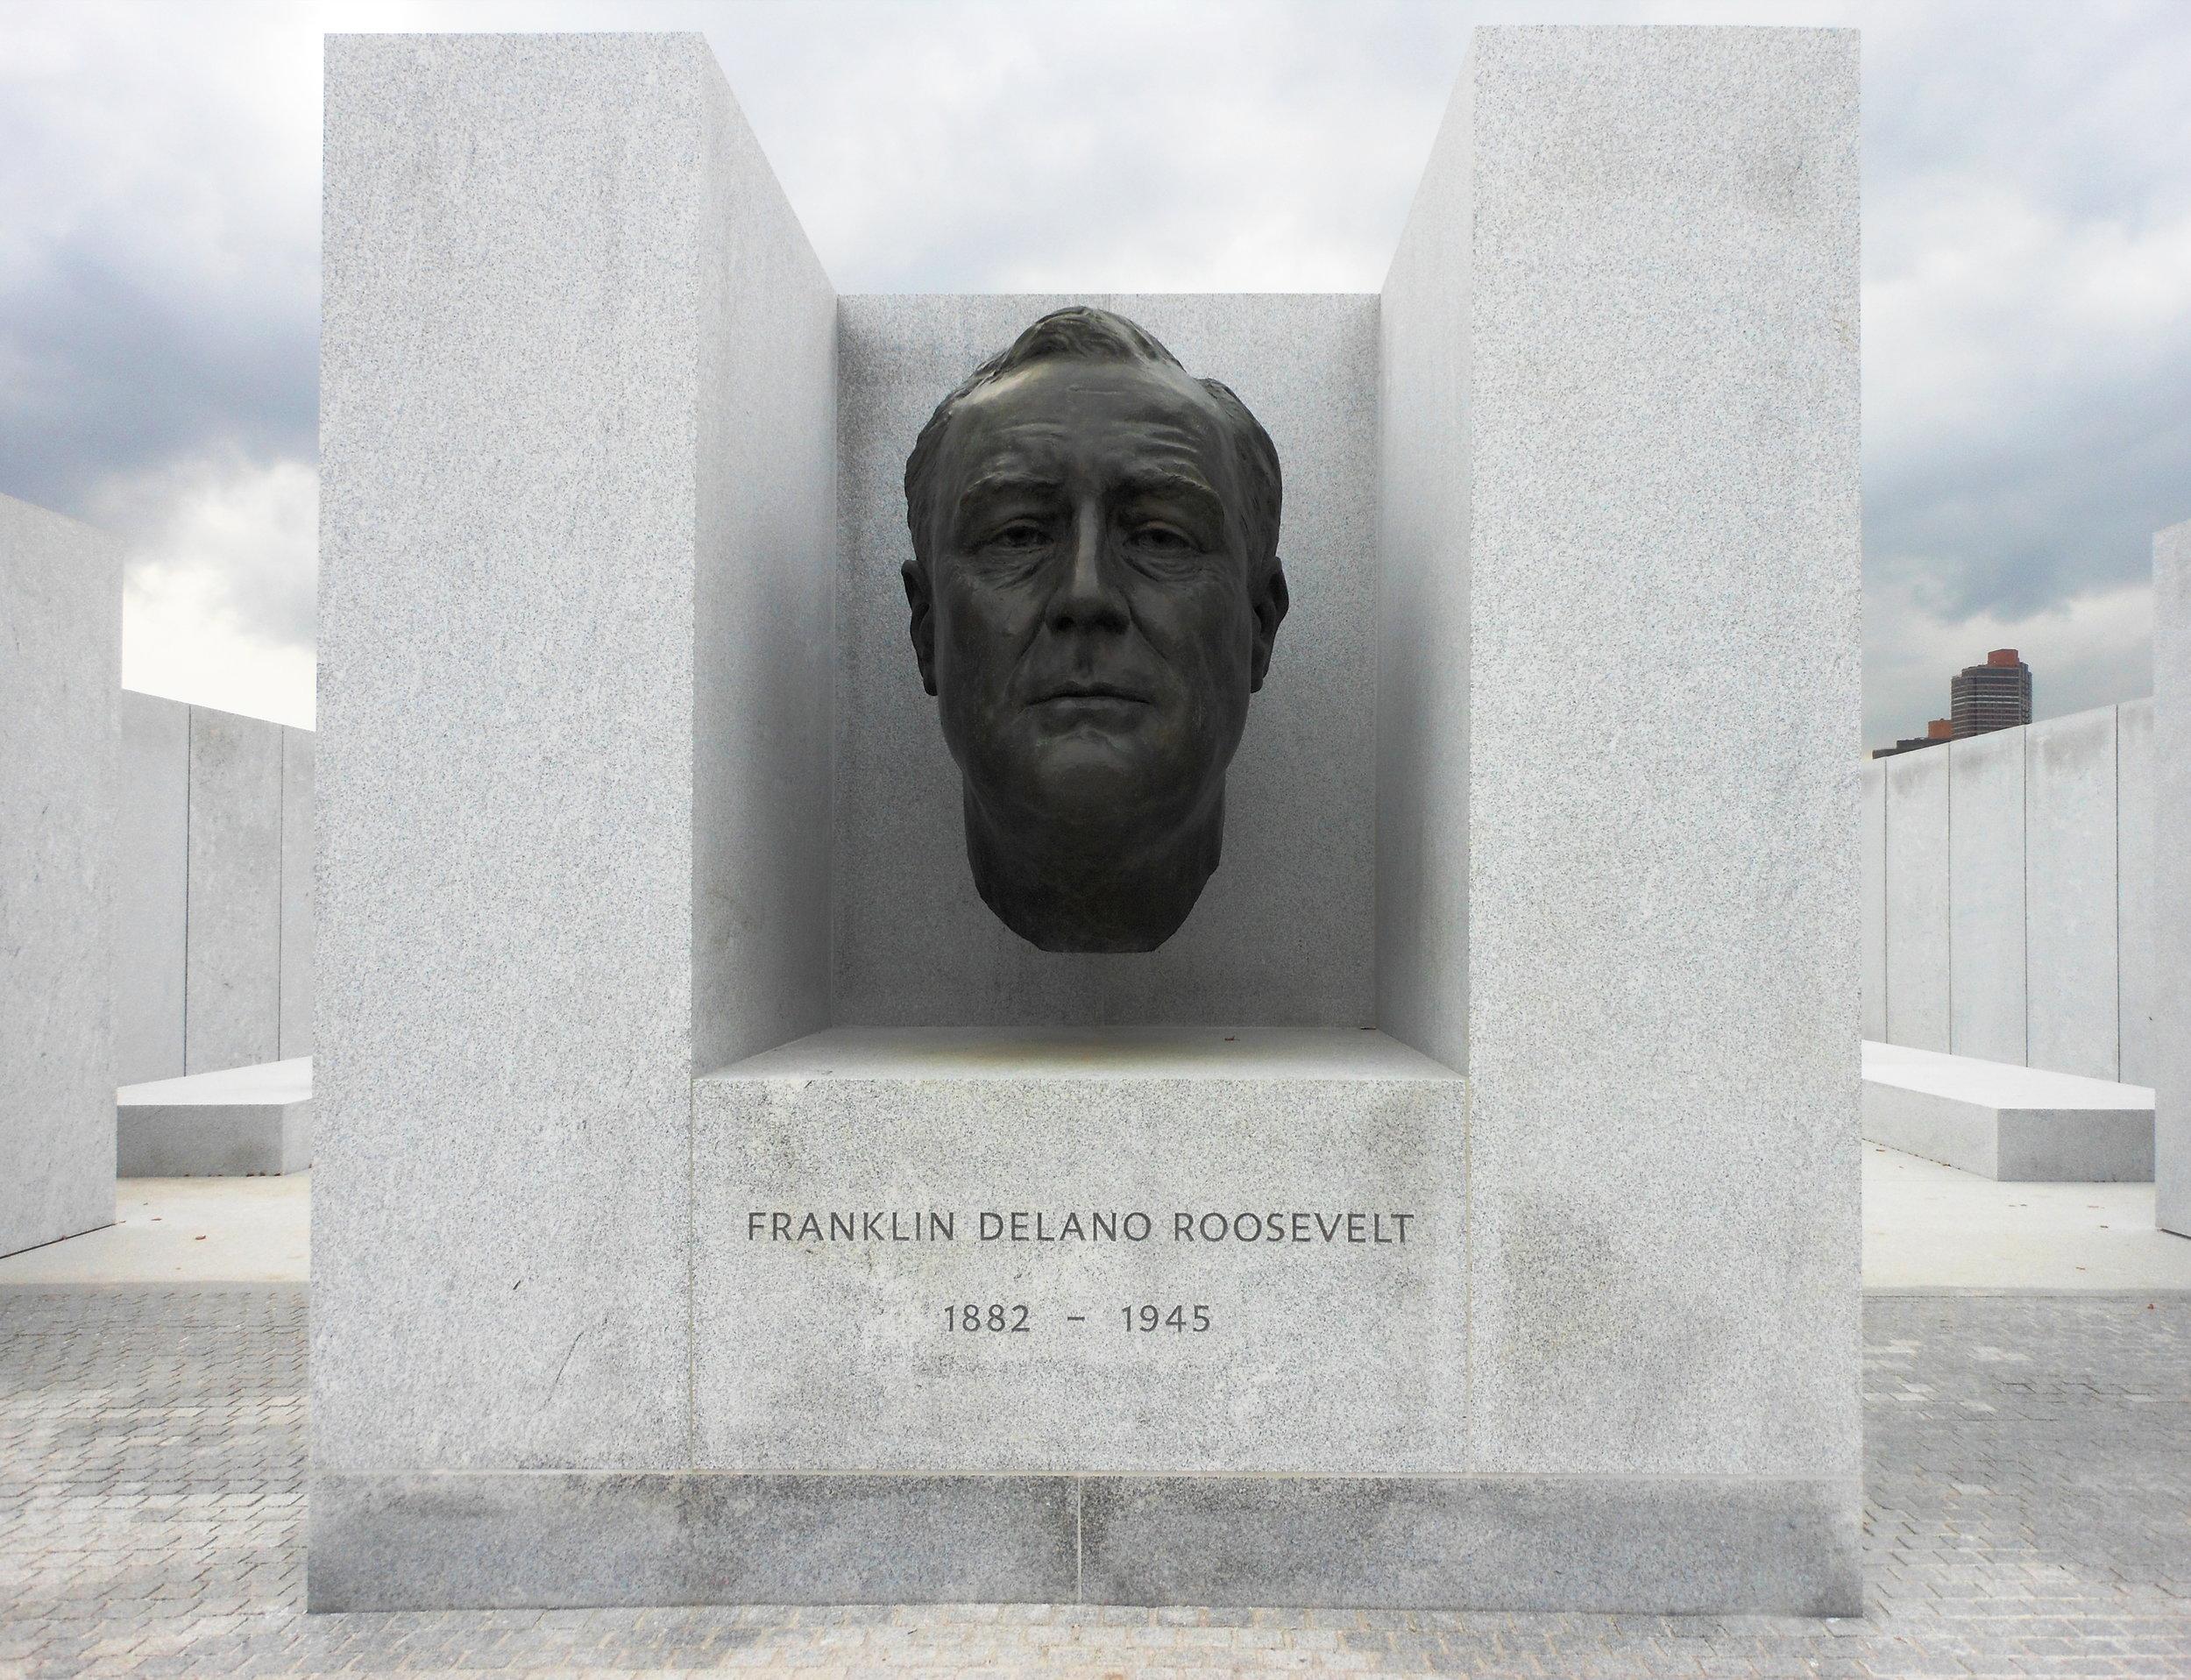 FDR_Statue_Roosevelt_Island.JPG